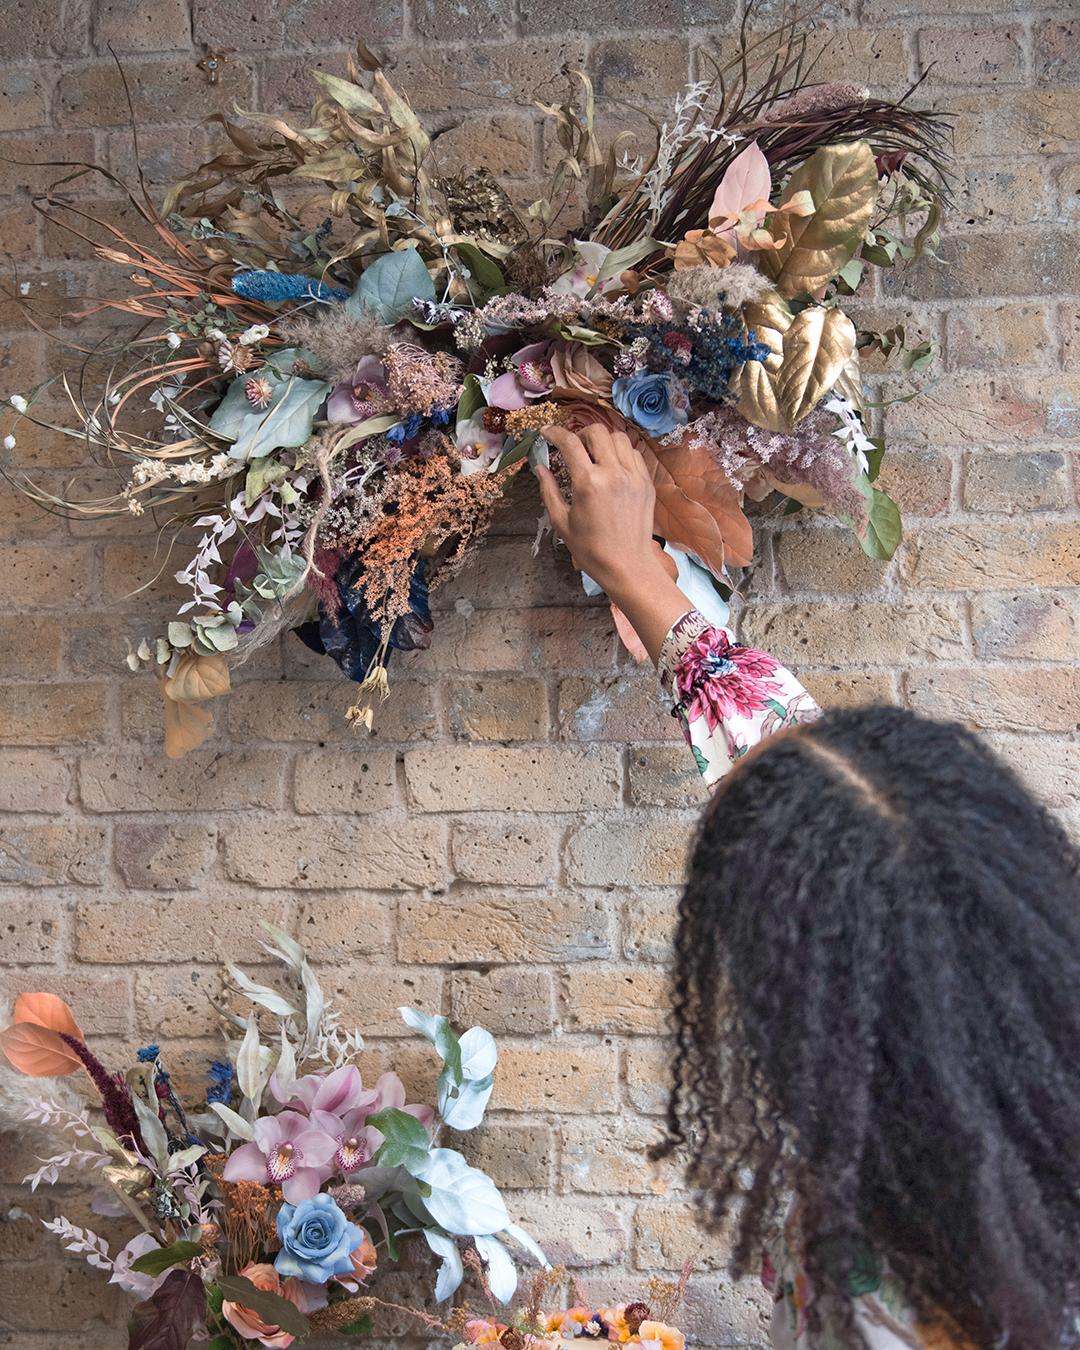 Nancy-straughan-hazel-gardiner-floral-fesign-grounded-creatives-meet-up-event.jpg